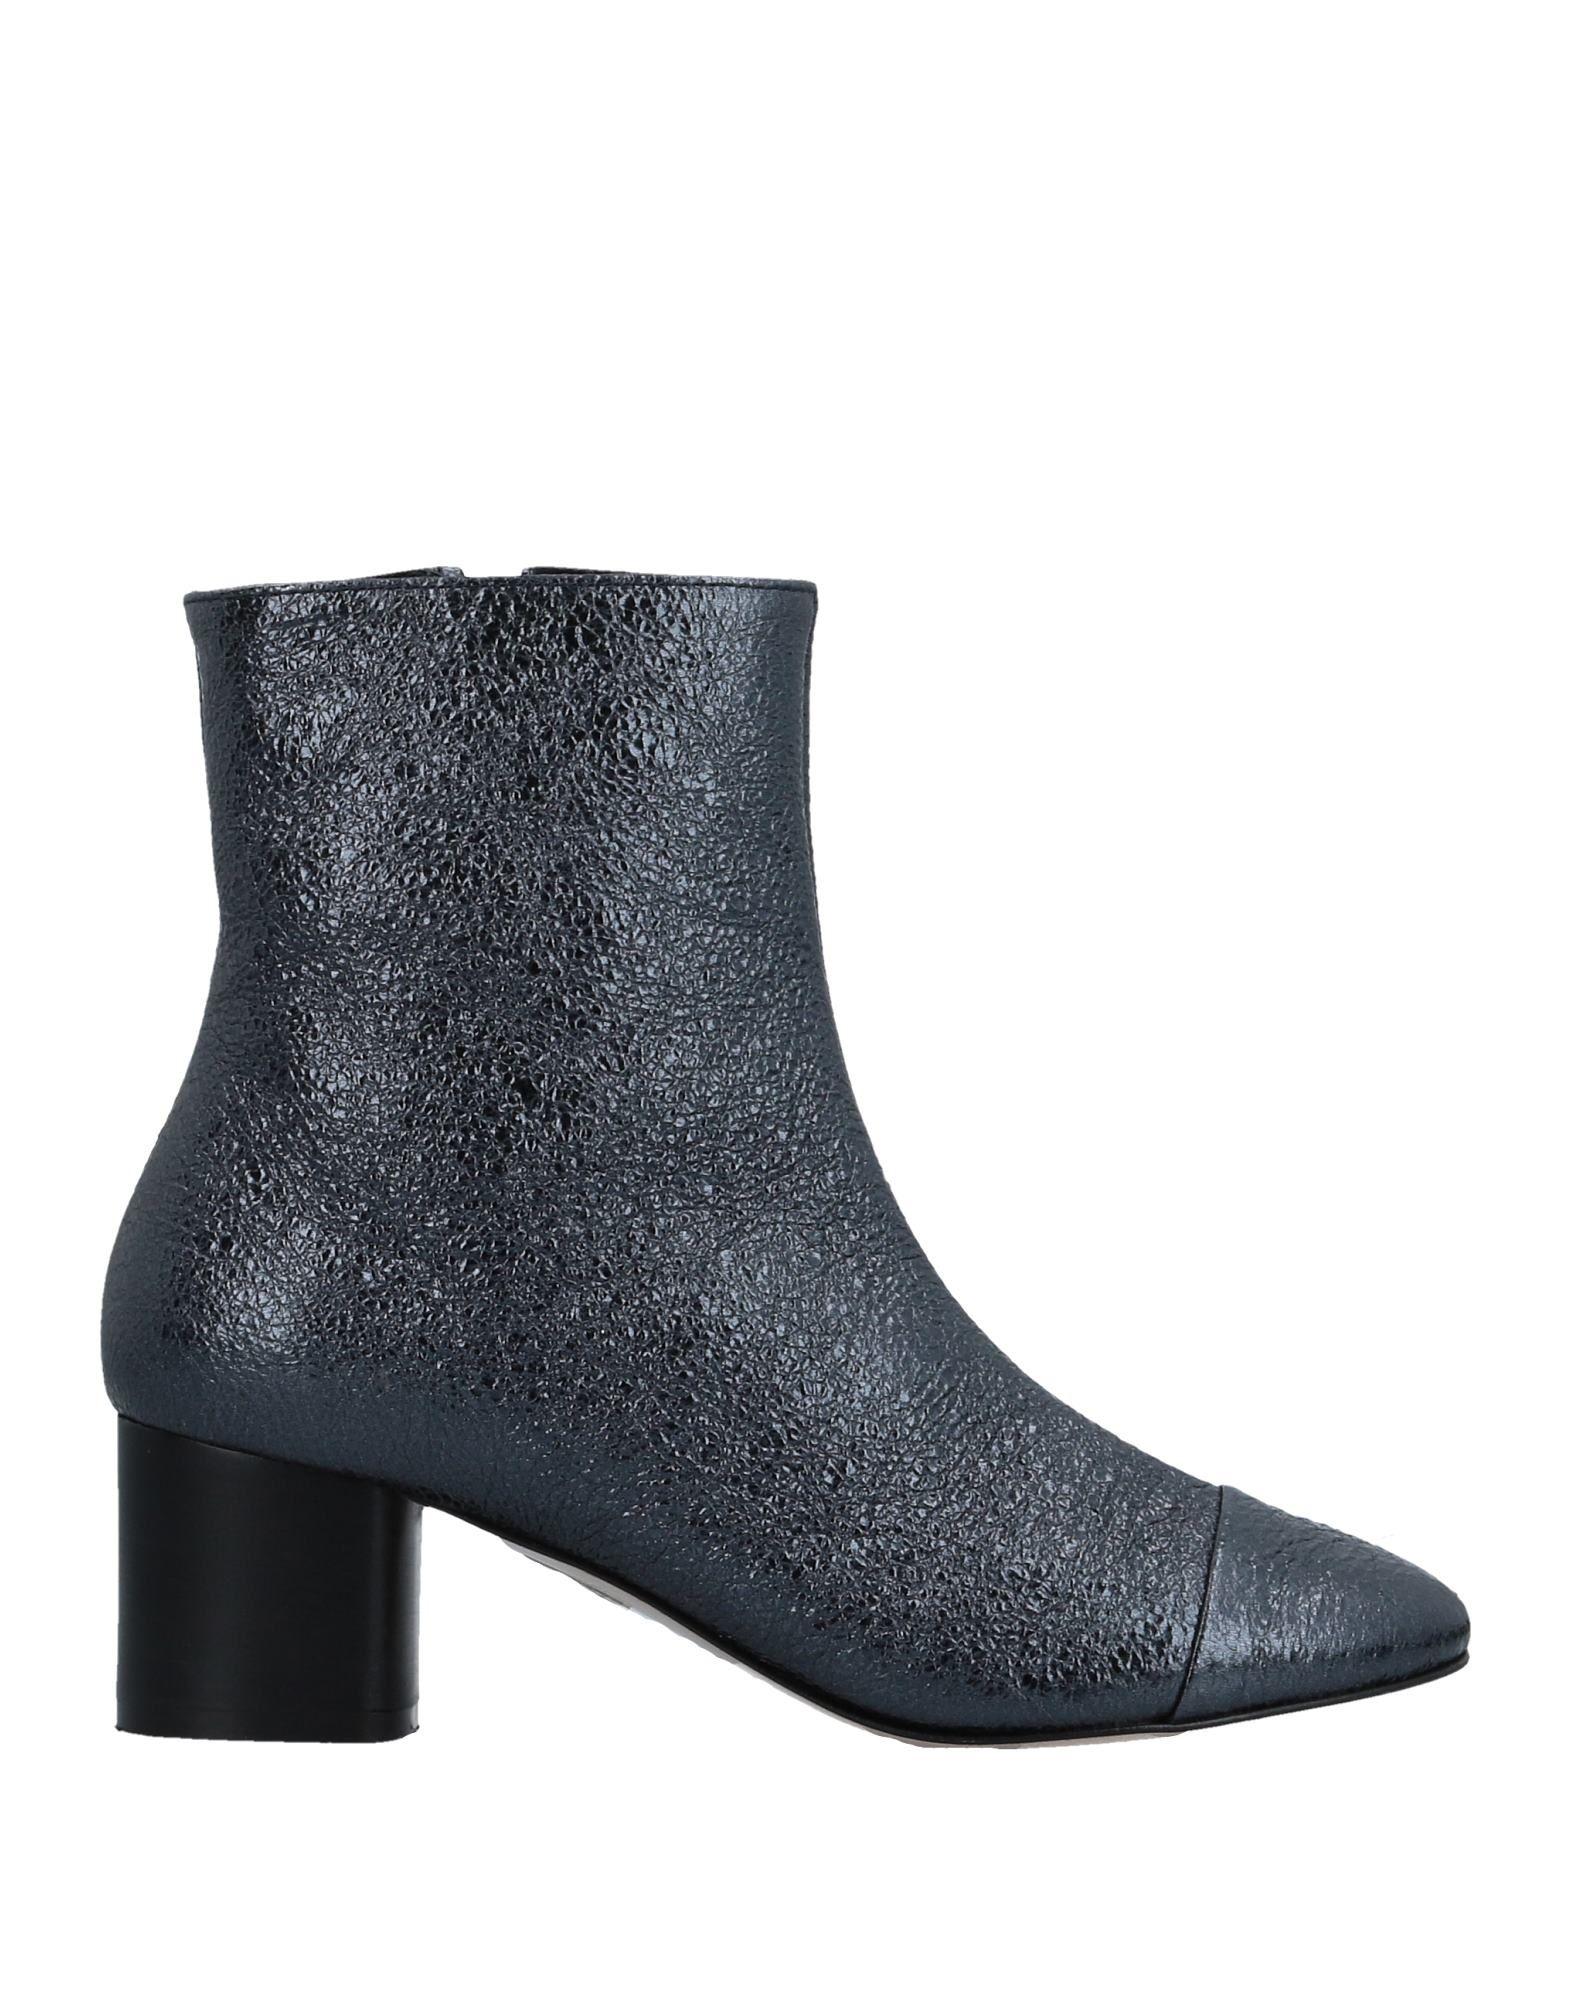 Bagatt Stiefelette Damen  11510185SA Gute Qualität beliebte Schuhe